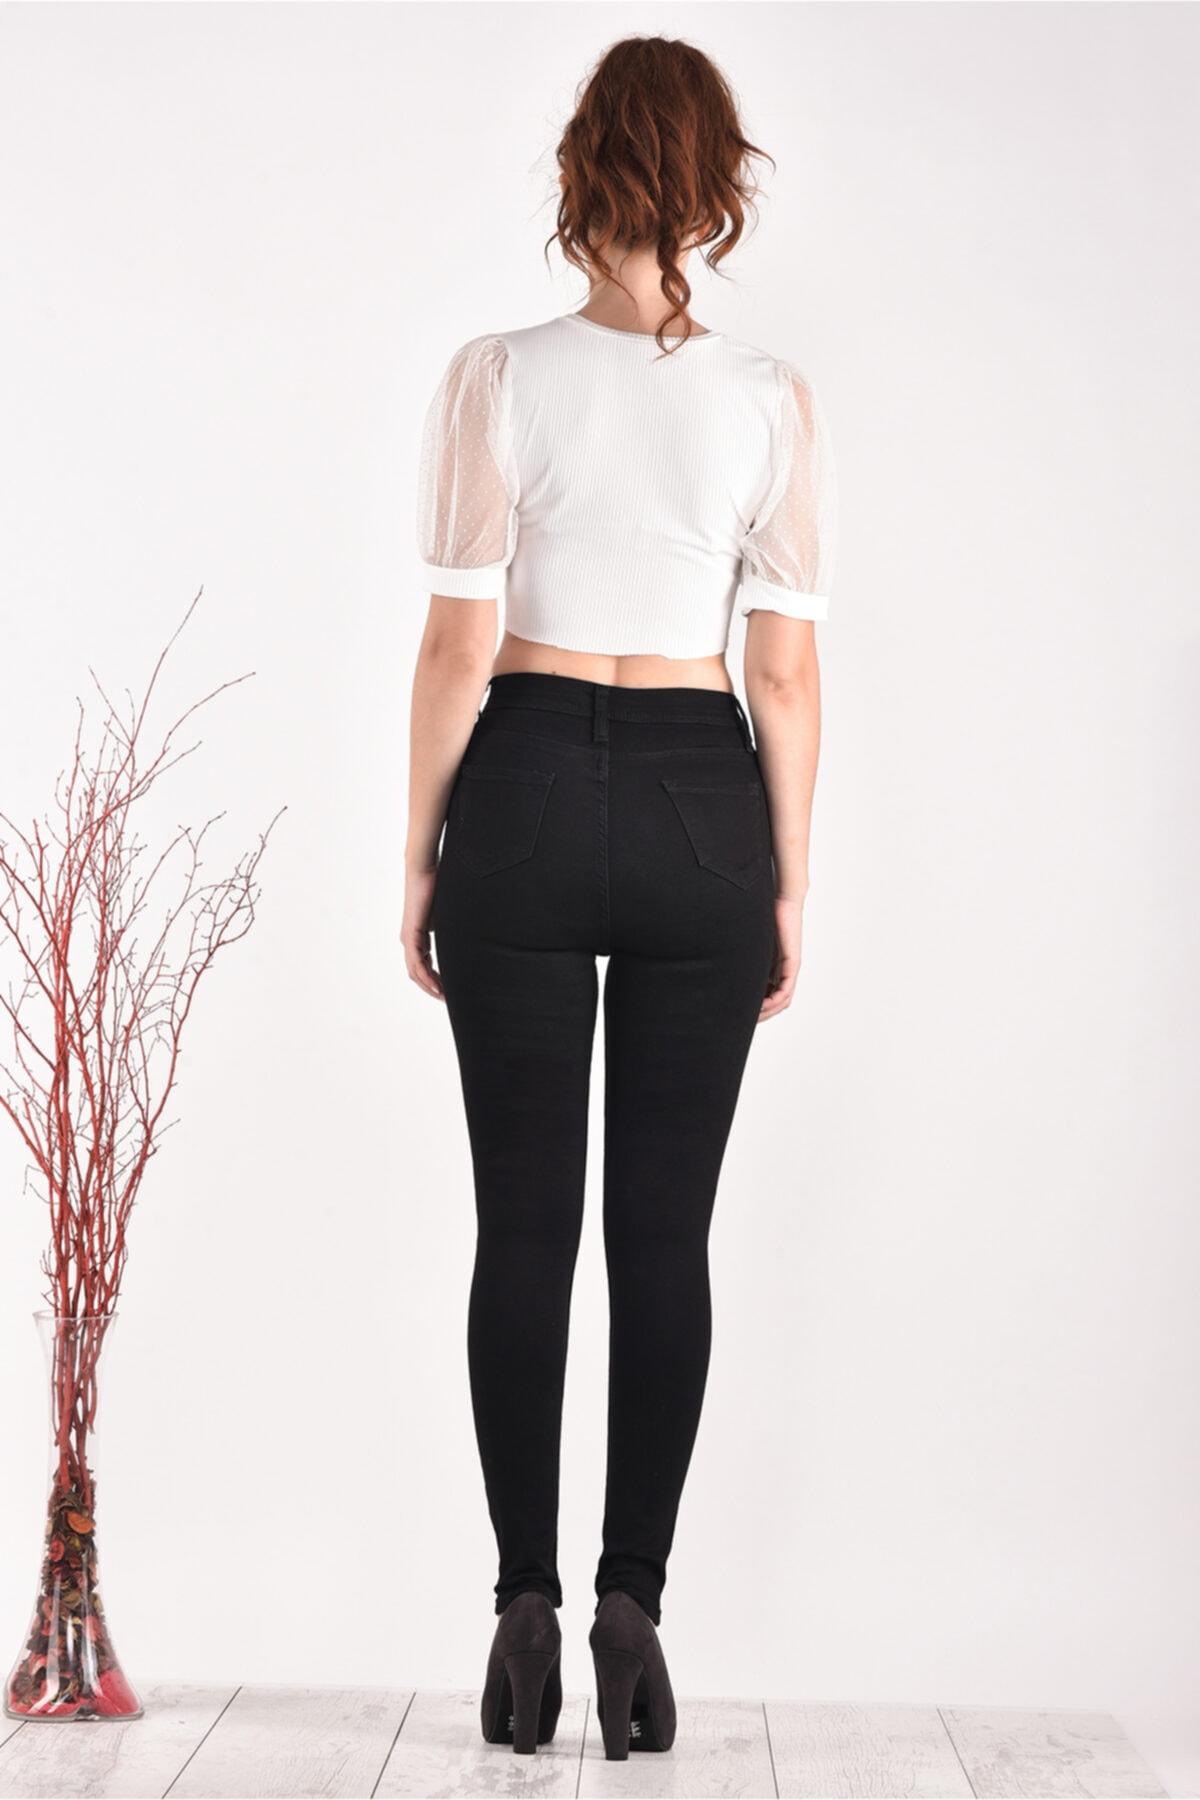 PANTOLOJİ Kadın Yüksek Bel Dar Paça 824 Model Black Bayan Jeans Pantolon 2